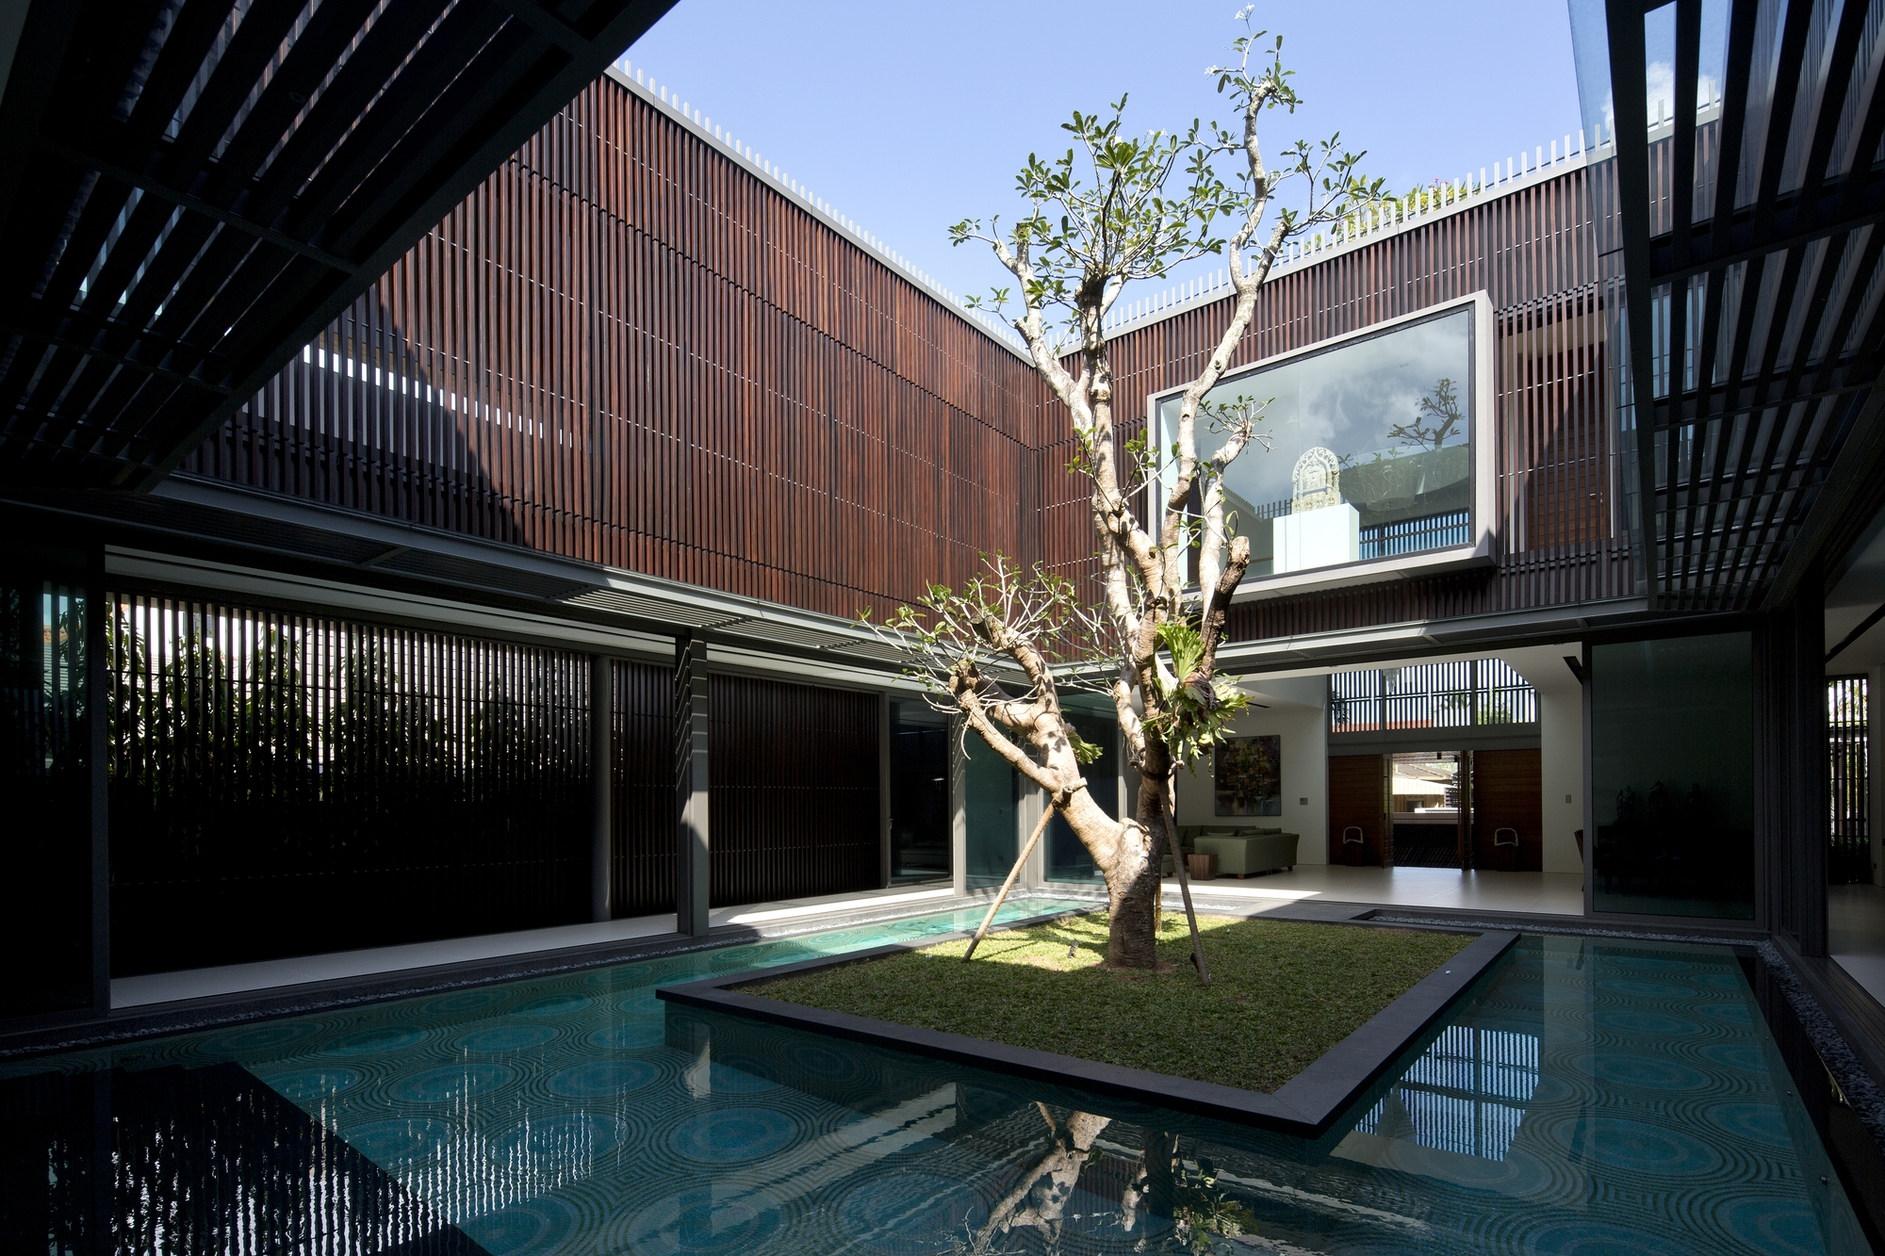 Centennial tree house by wallflower architecture design for Architecture and design tree house